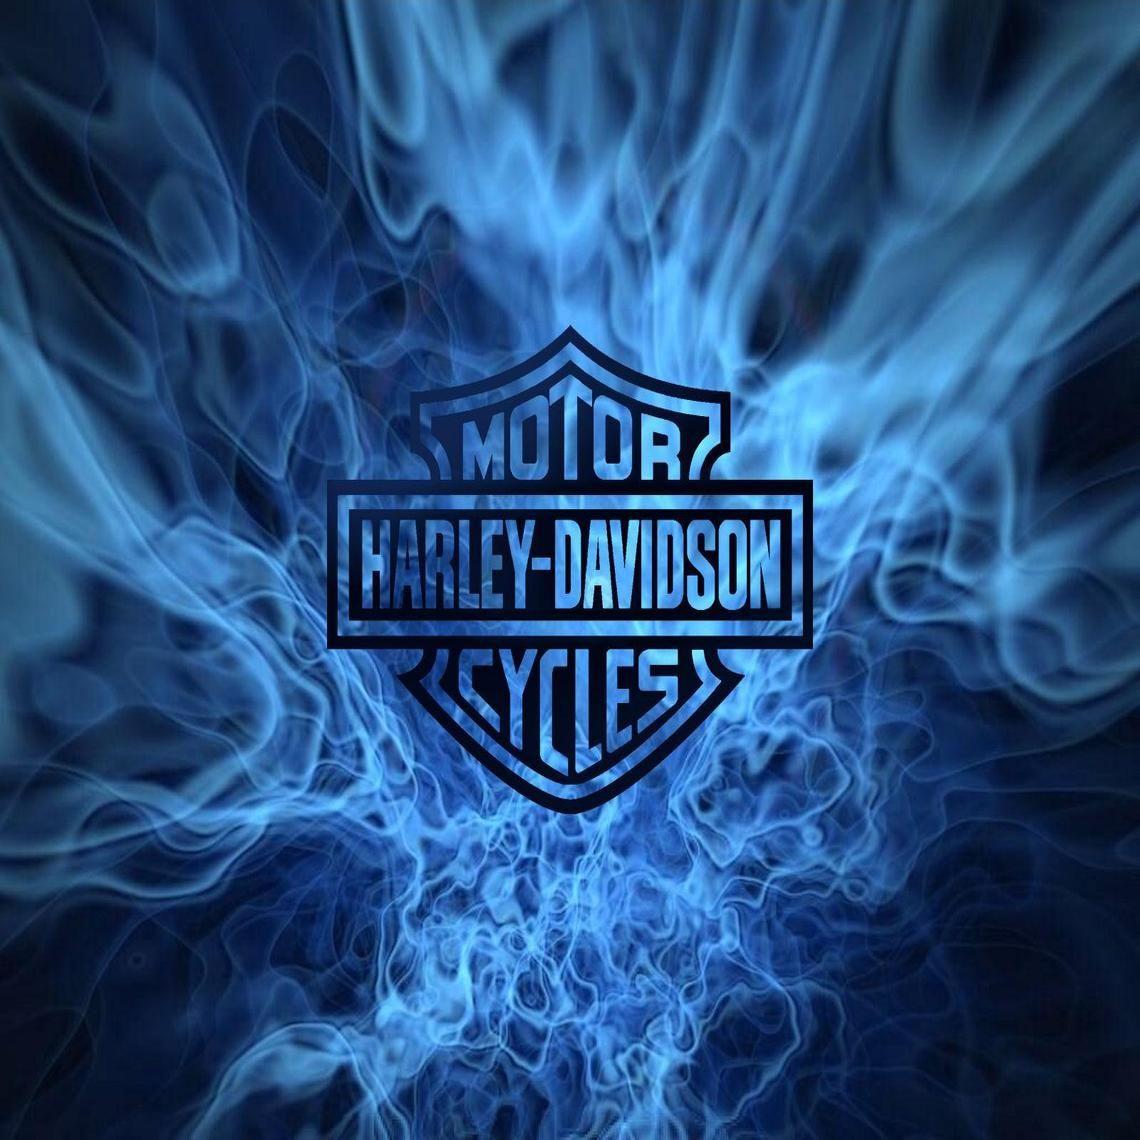 Hd Chiefs Wallpaper: Harley-Davidson Blue Flames